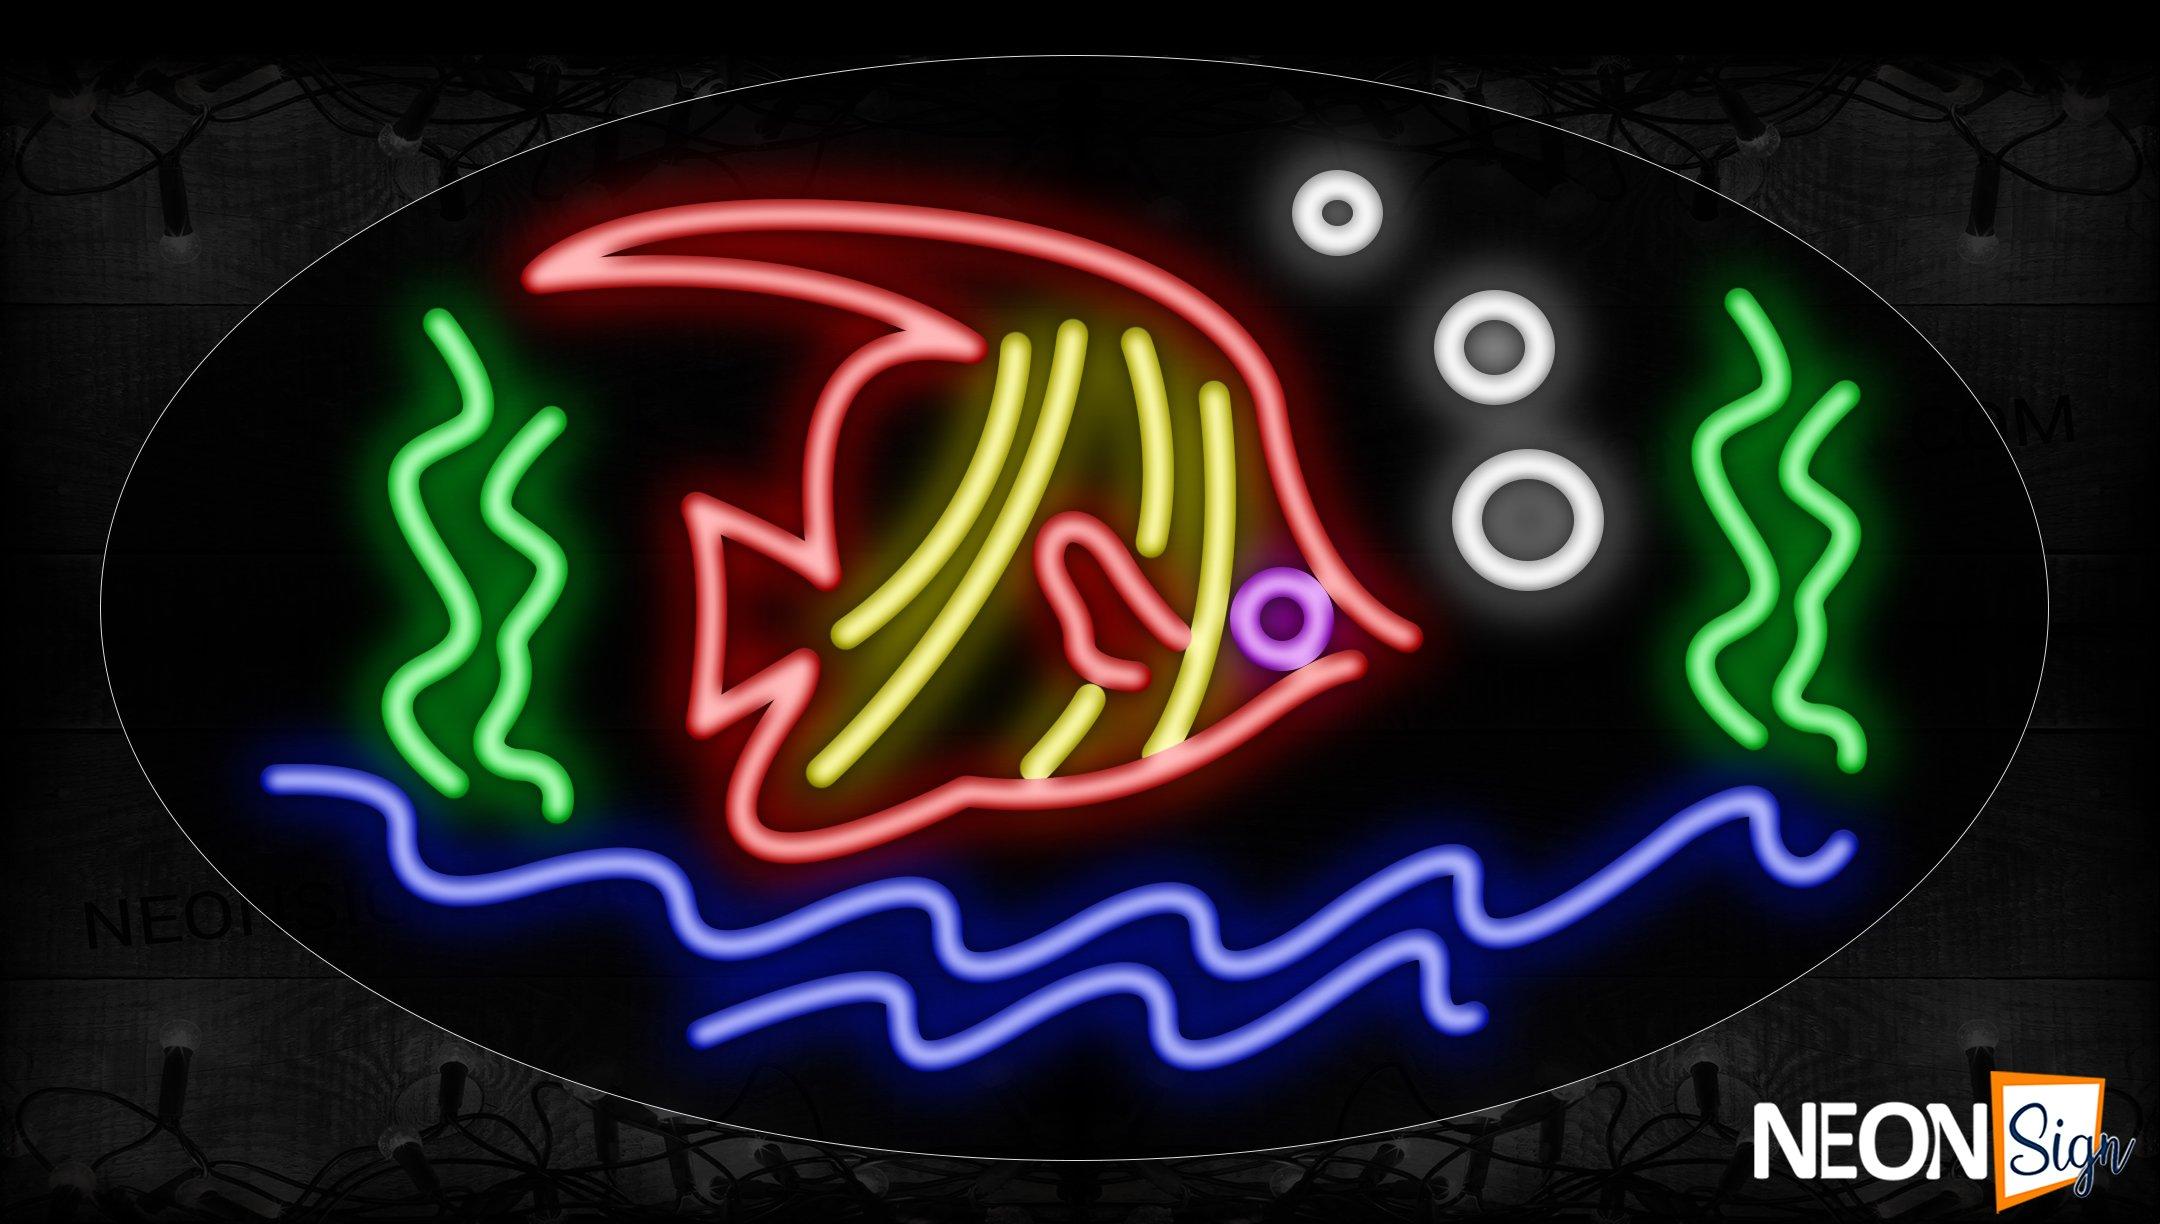 Fish And Sea Logo Neon Sign - NeonSign.com - photo#11